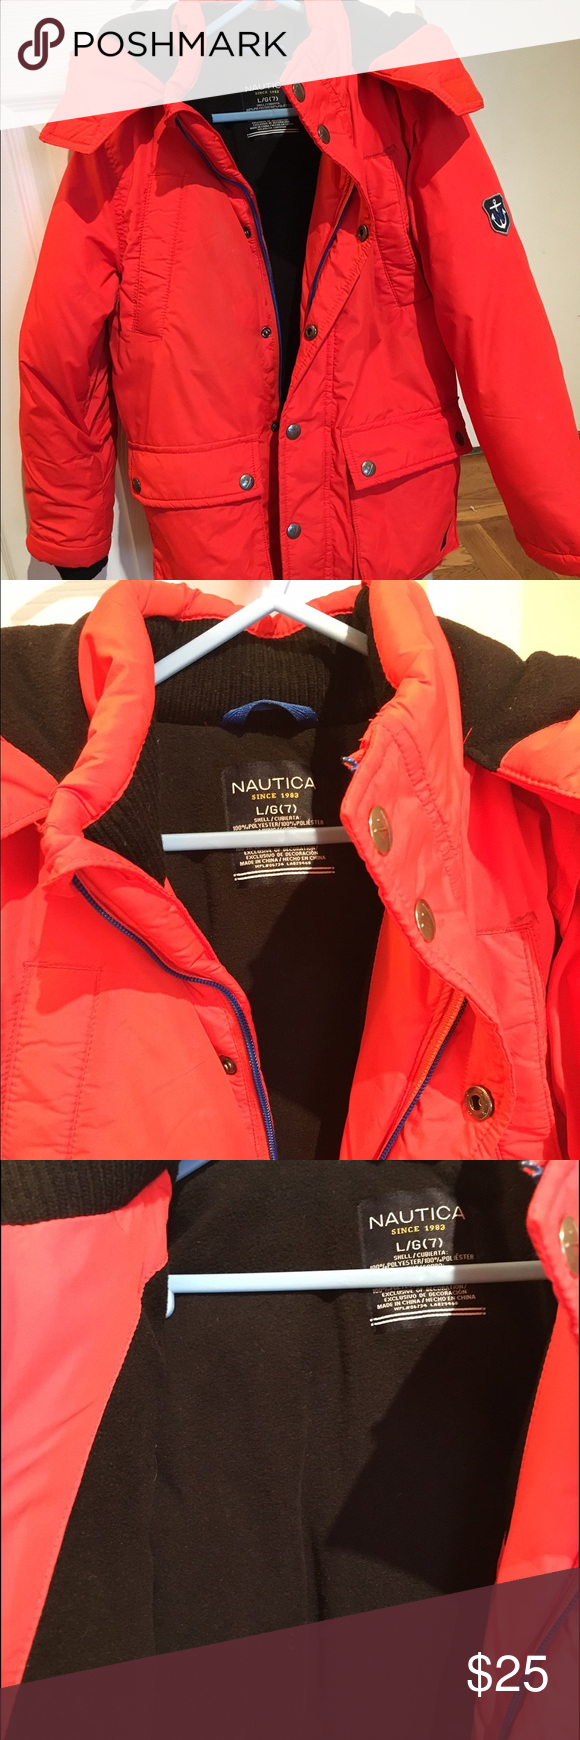 2bb9ba674240 SOLD Boys heavy jacket